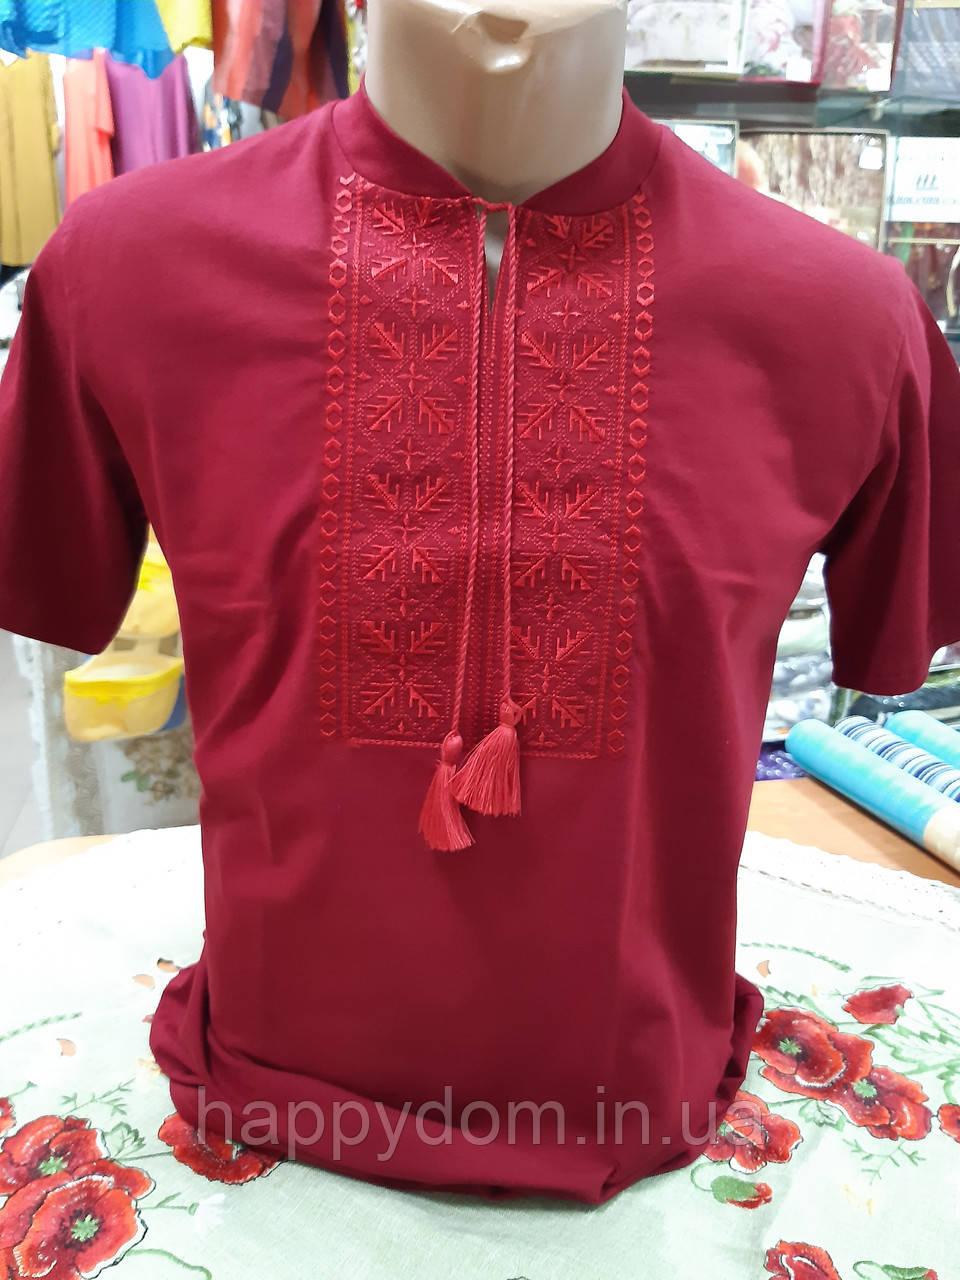 Вышиванка футболка мужская бордовая